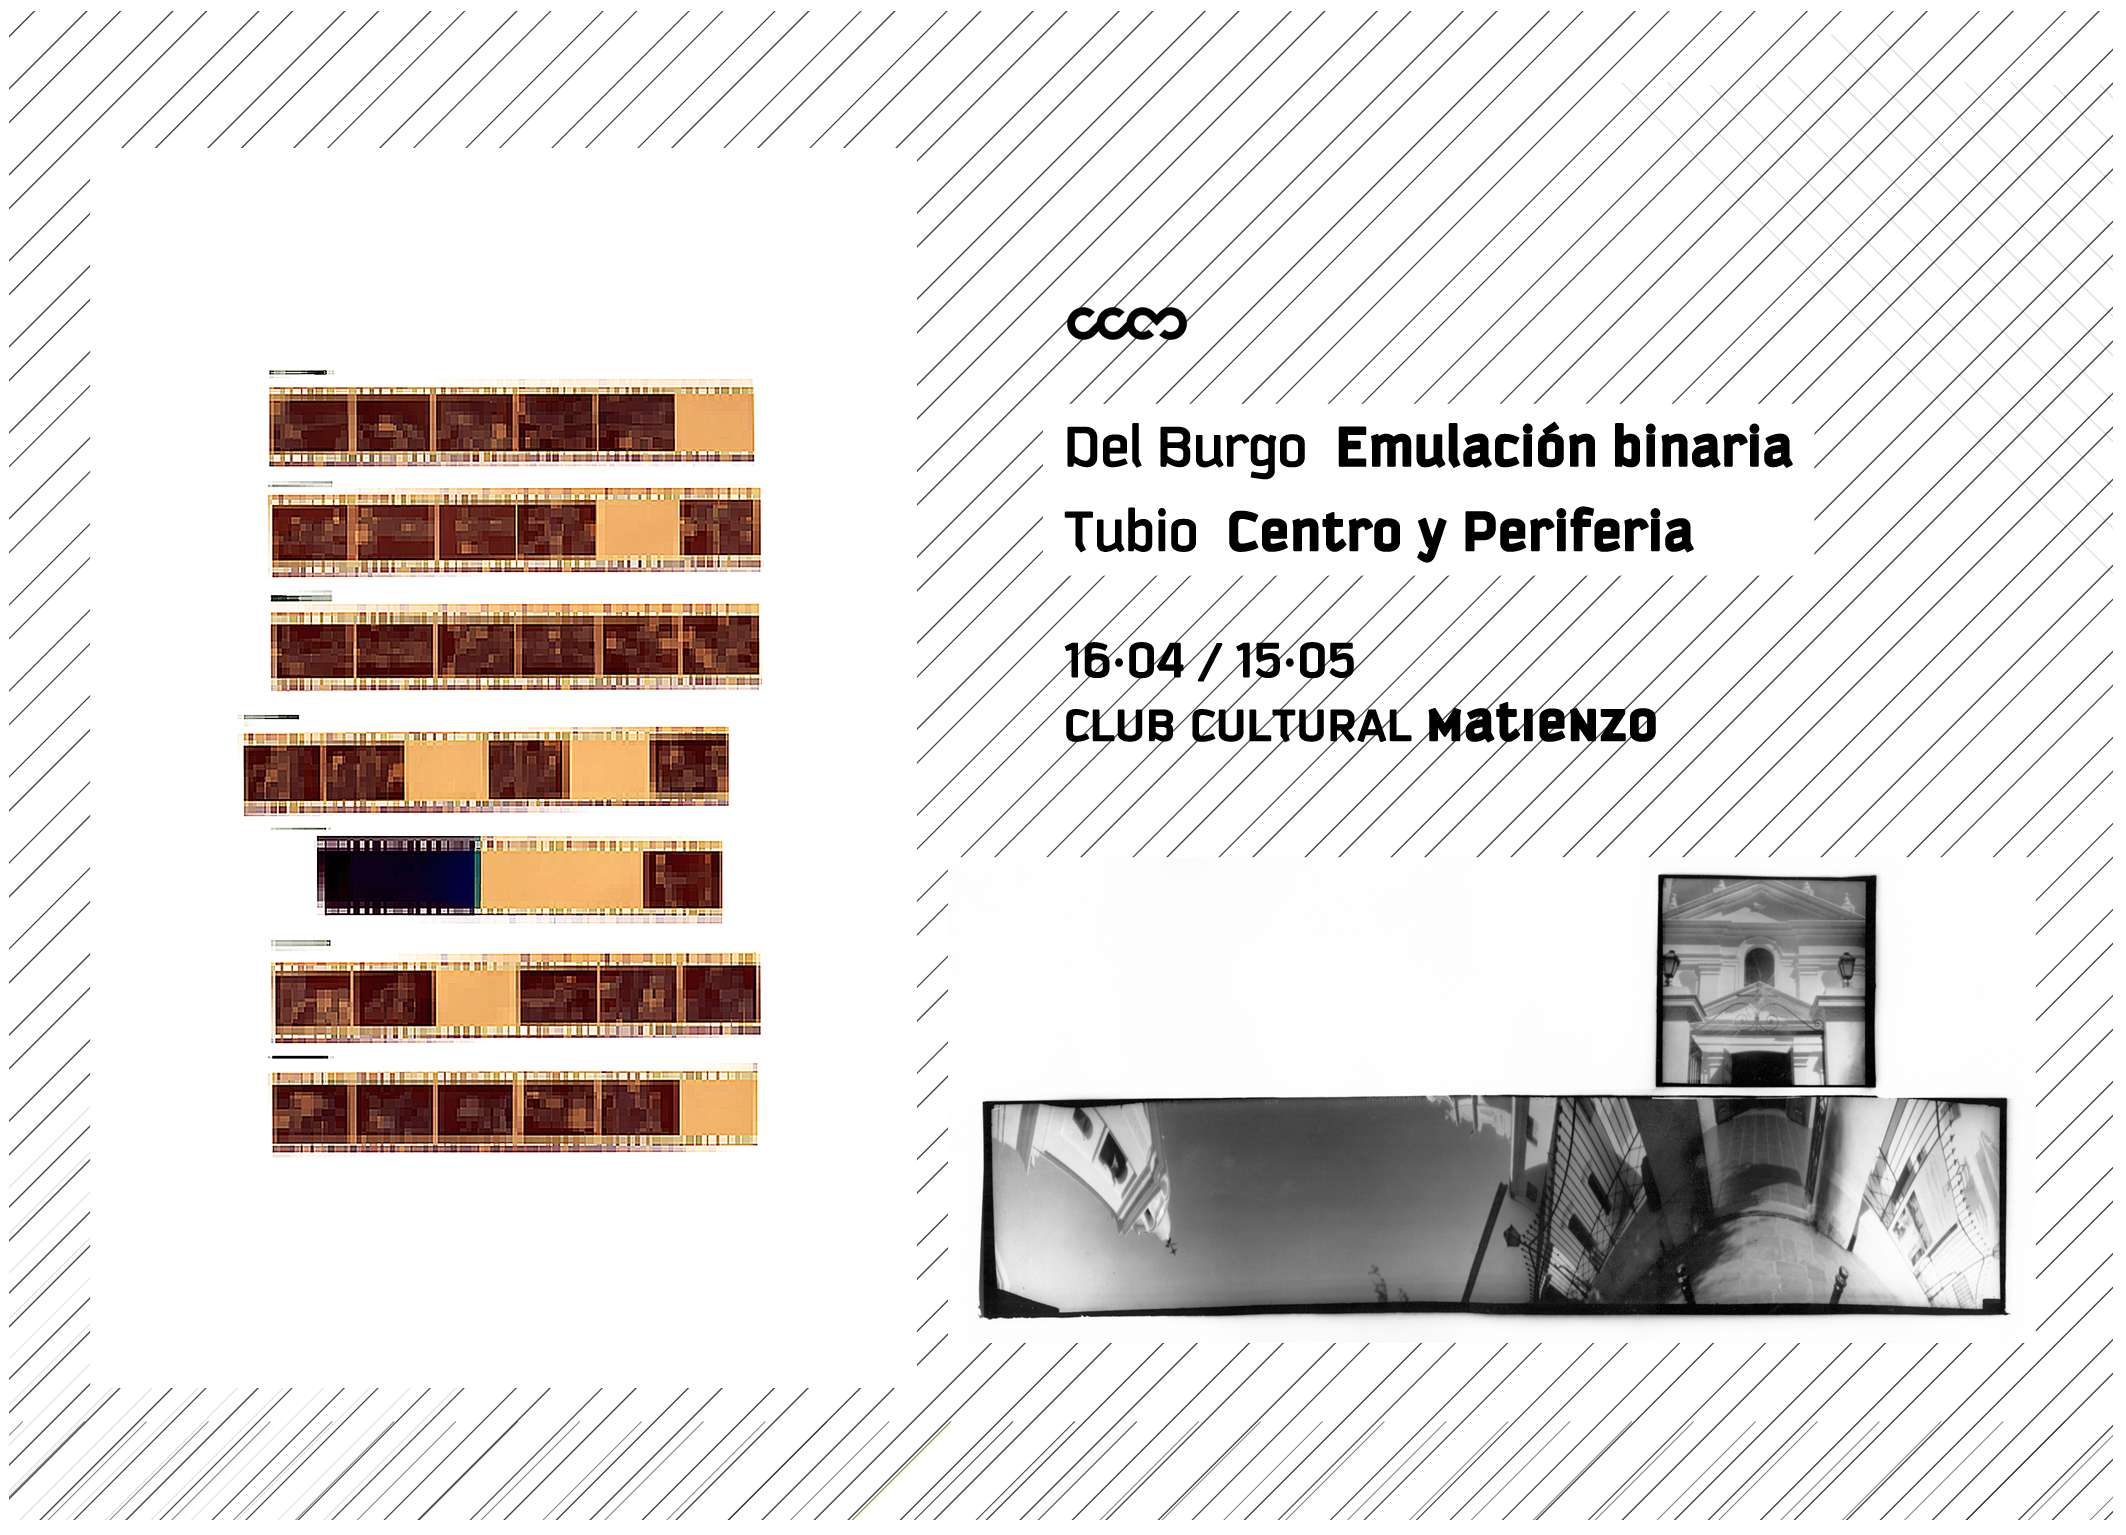 http://clubculturalmatienzo.files.wordpress.com/2010/04/artetubioburgos3.jpg